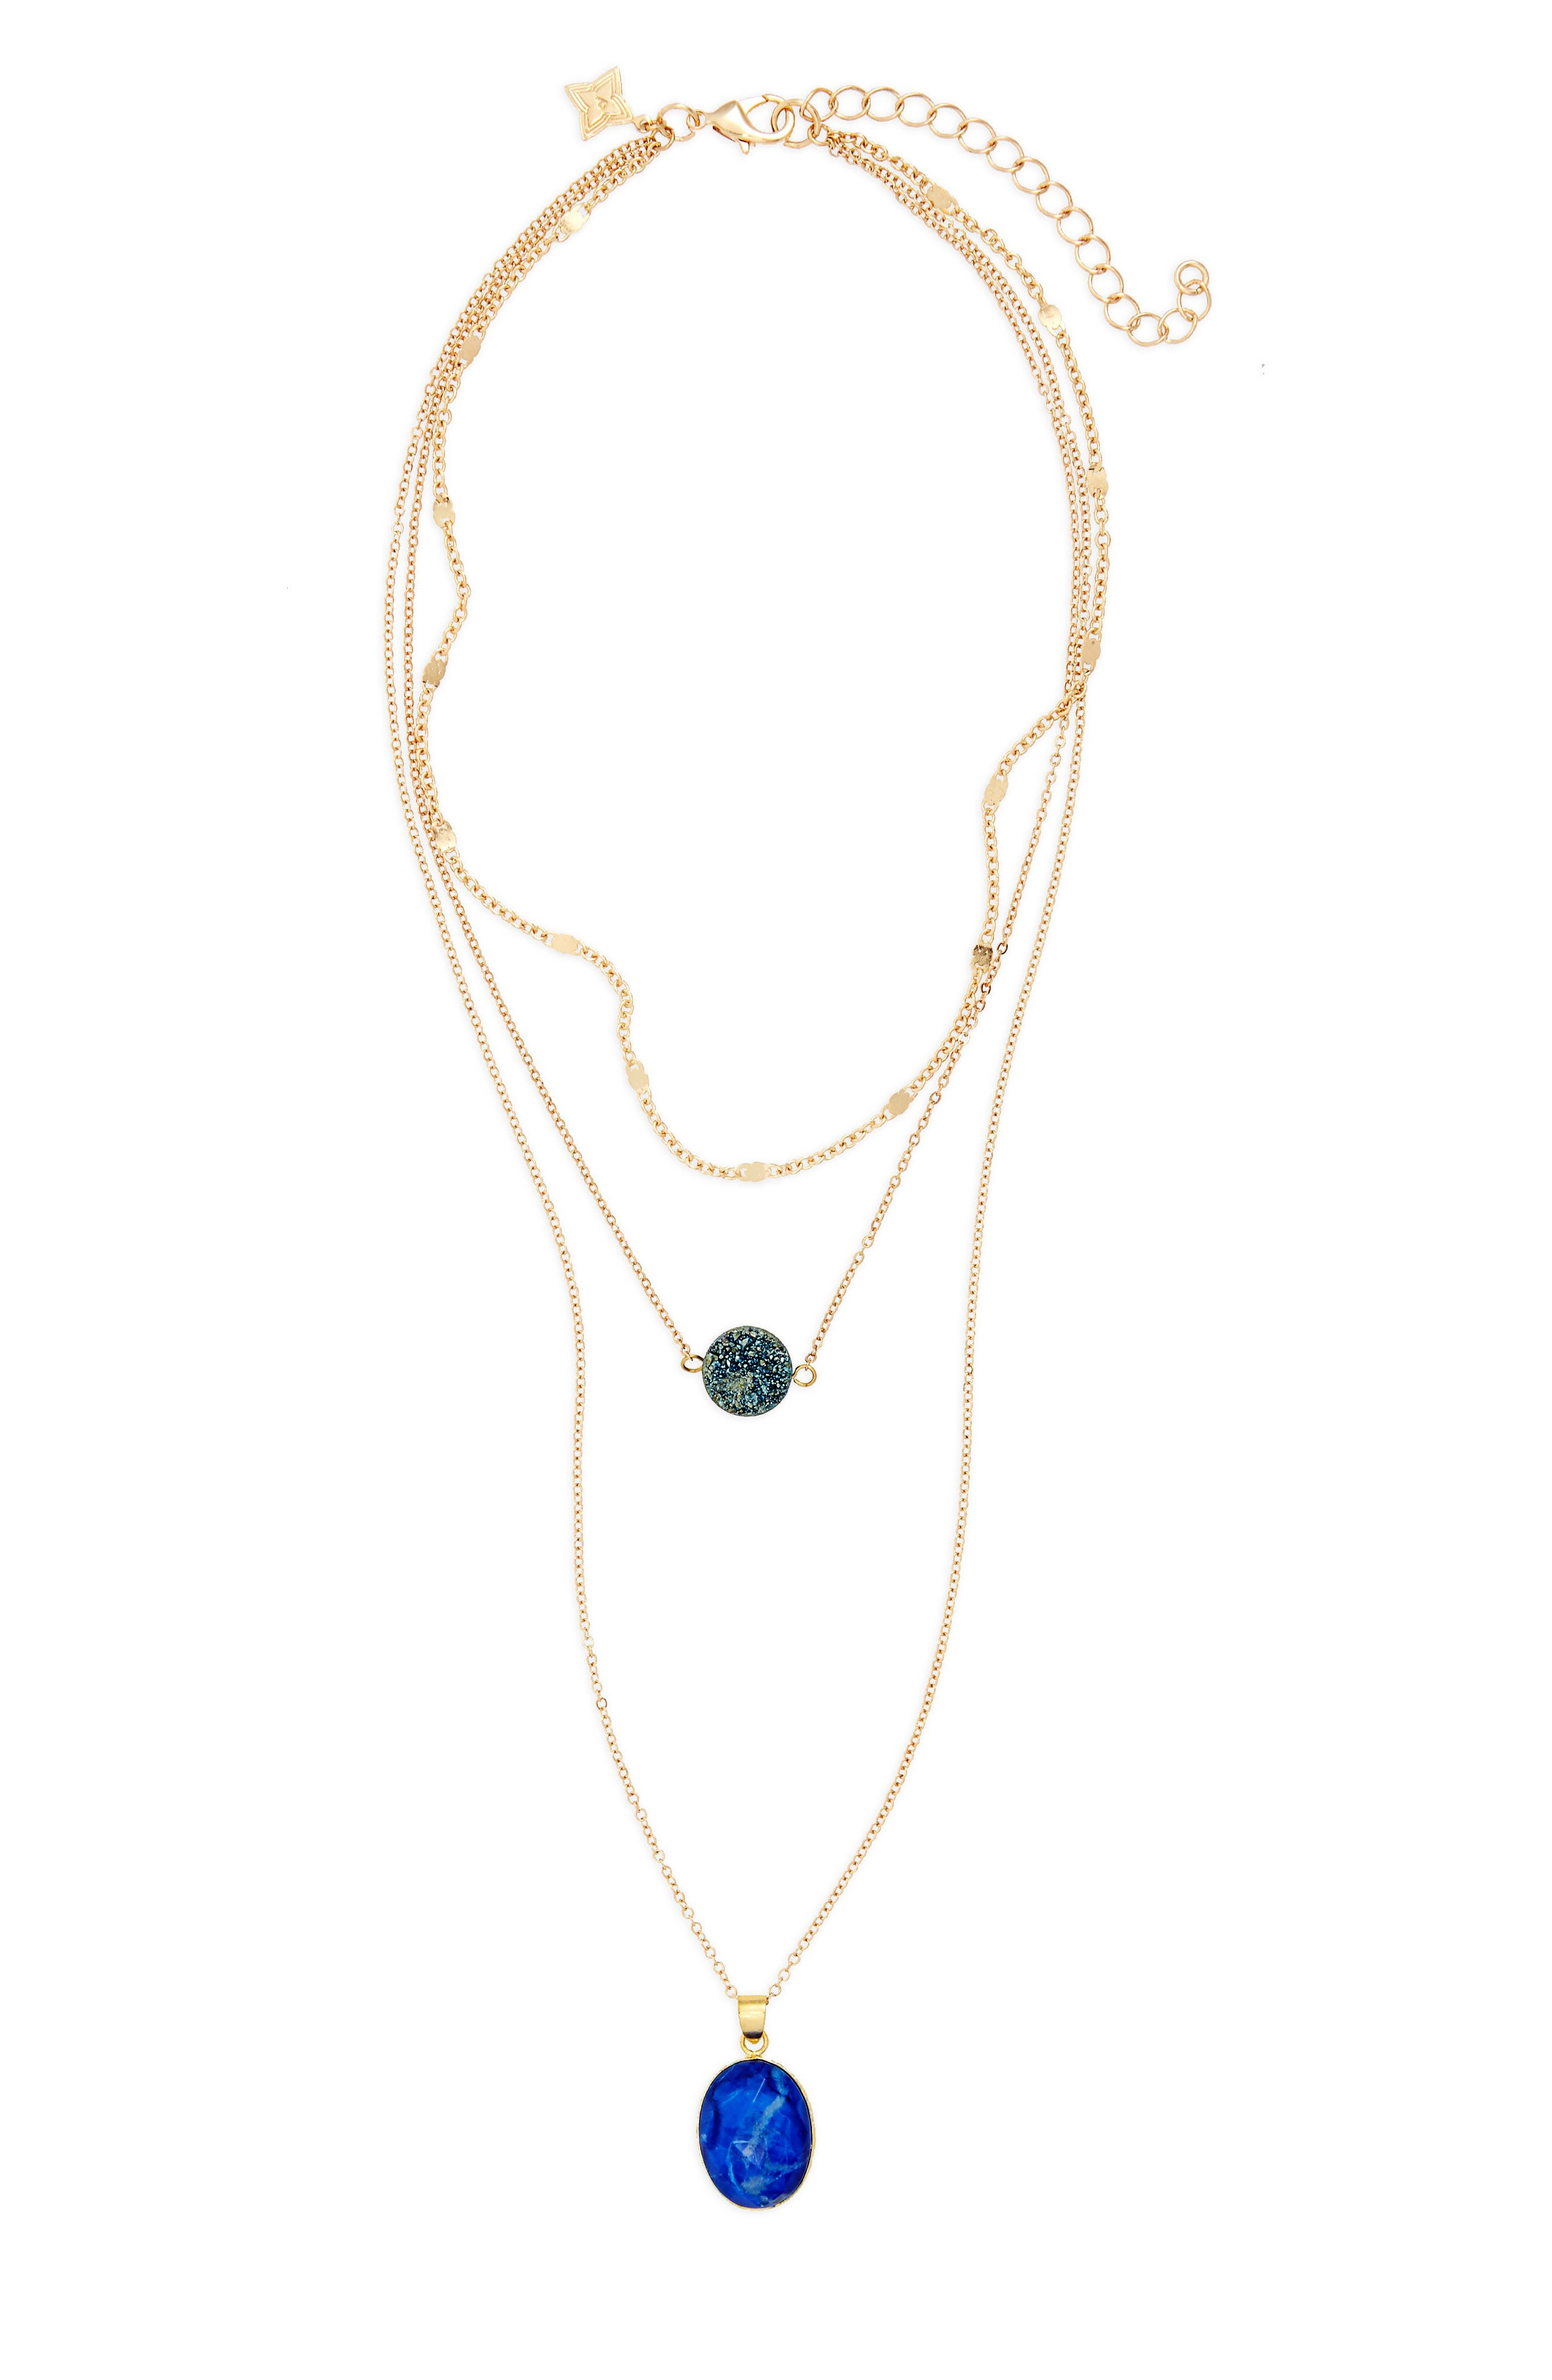 Alternate Image 1 Selected - Panacea Multistrand Pendant Necklace